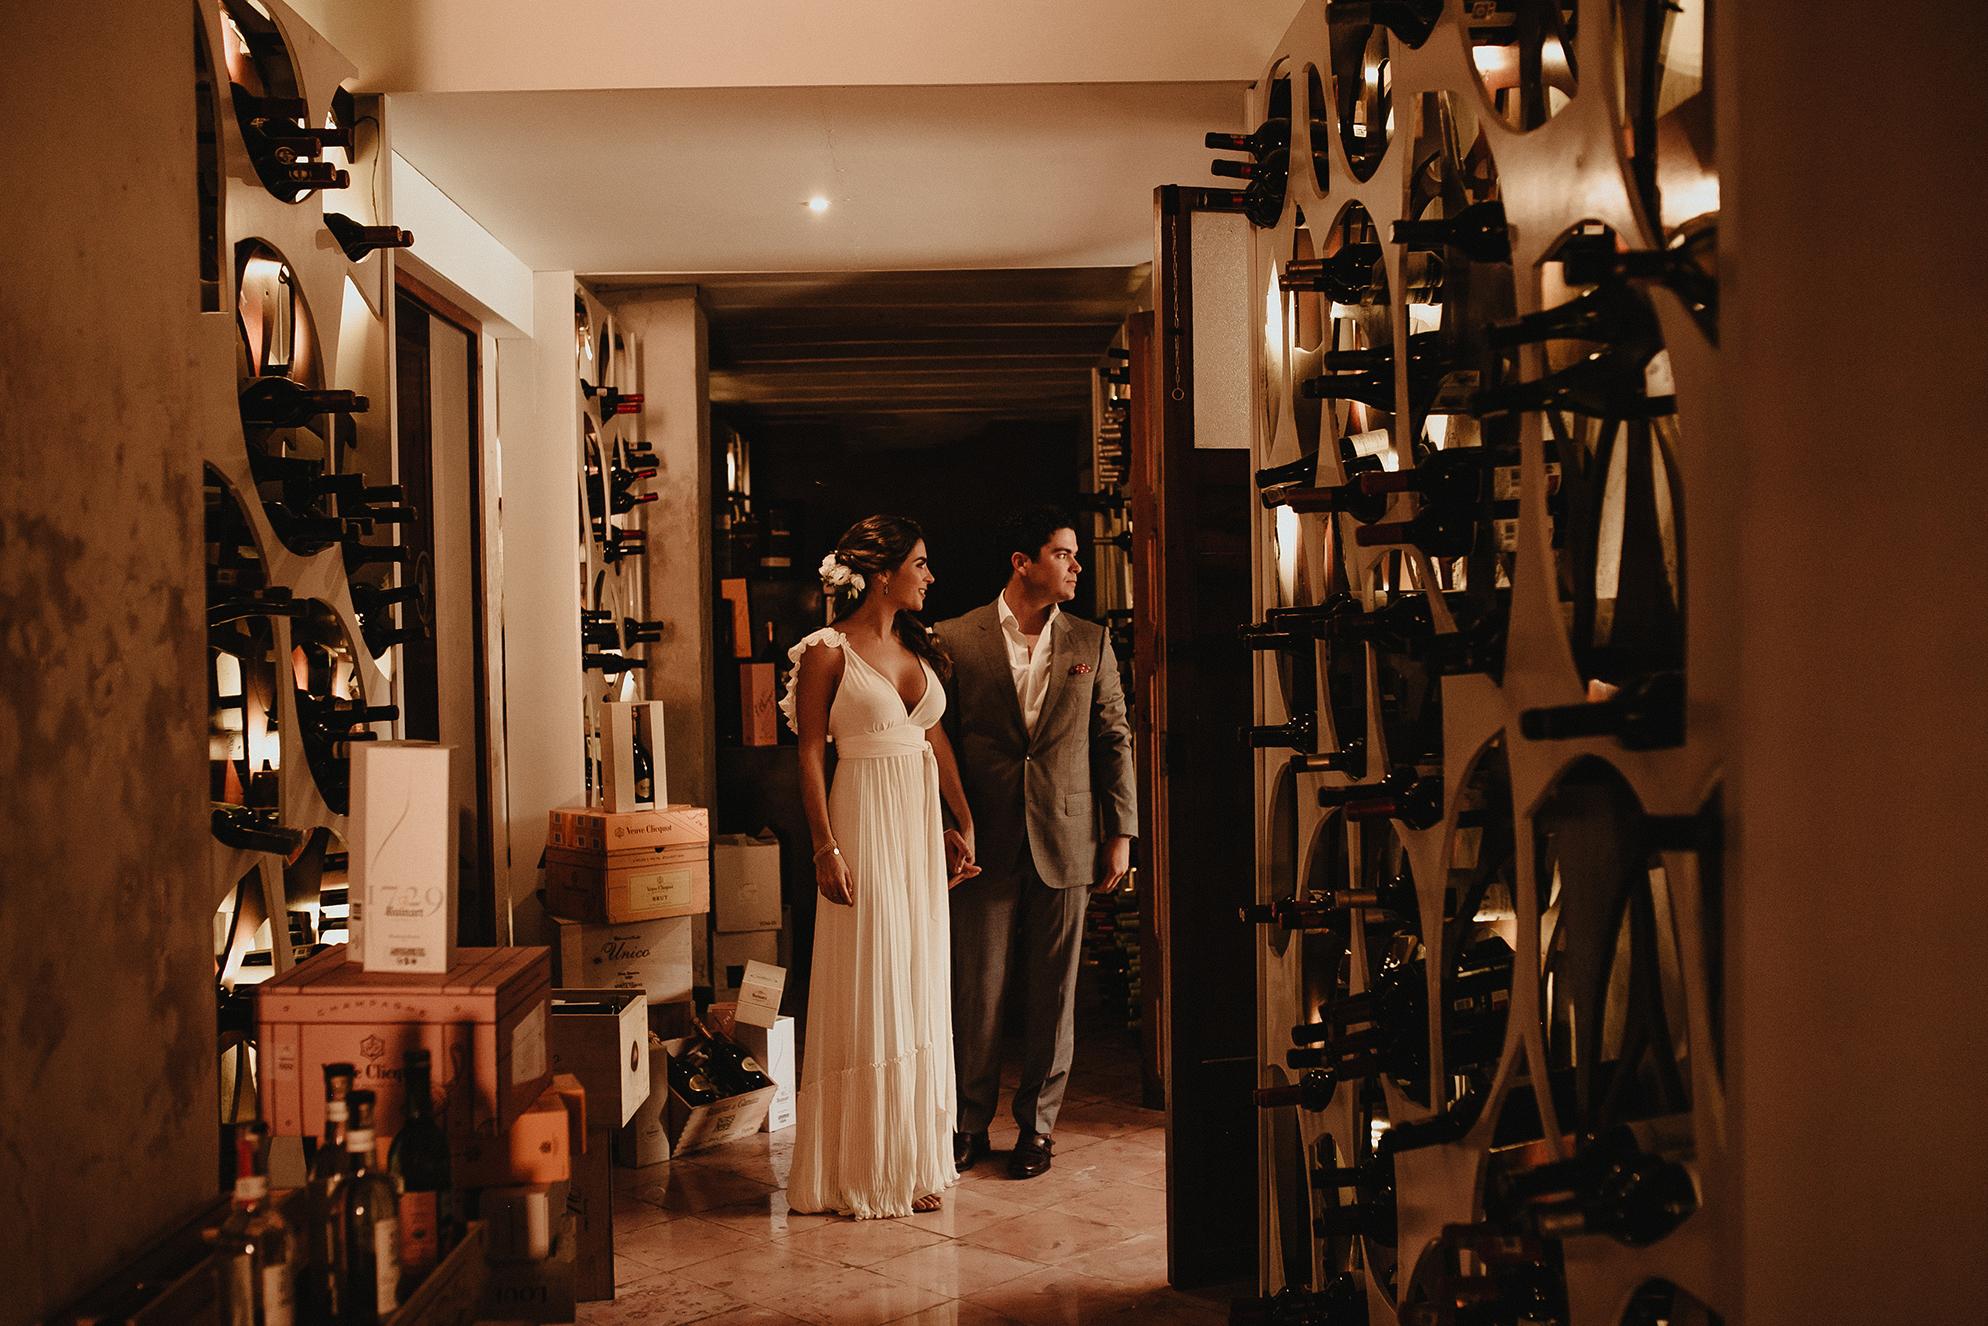 0063civil_Hacienda_WeddingDstination_MeridaYucatan_HaciendasMerida_BodasMexico_BodasYucatan_Boda_Destino.jpg